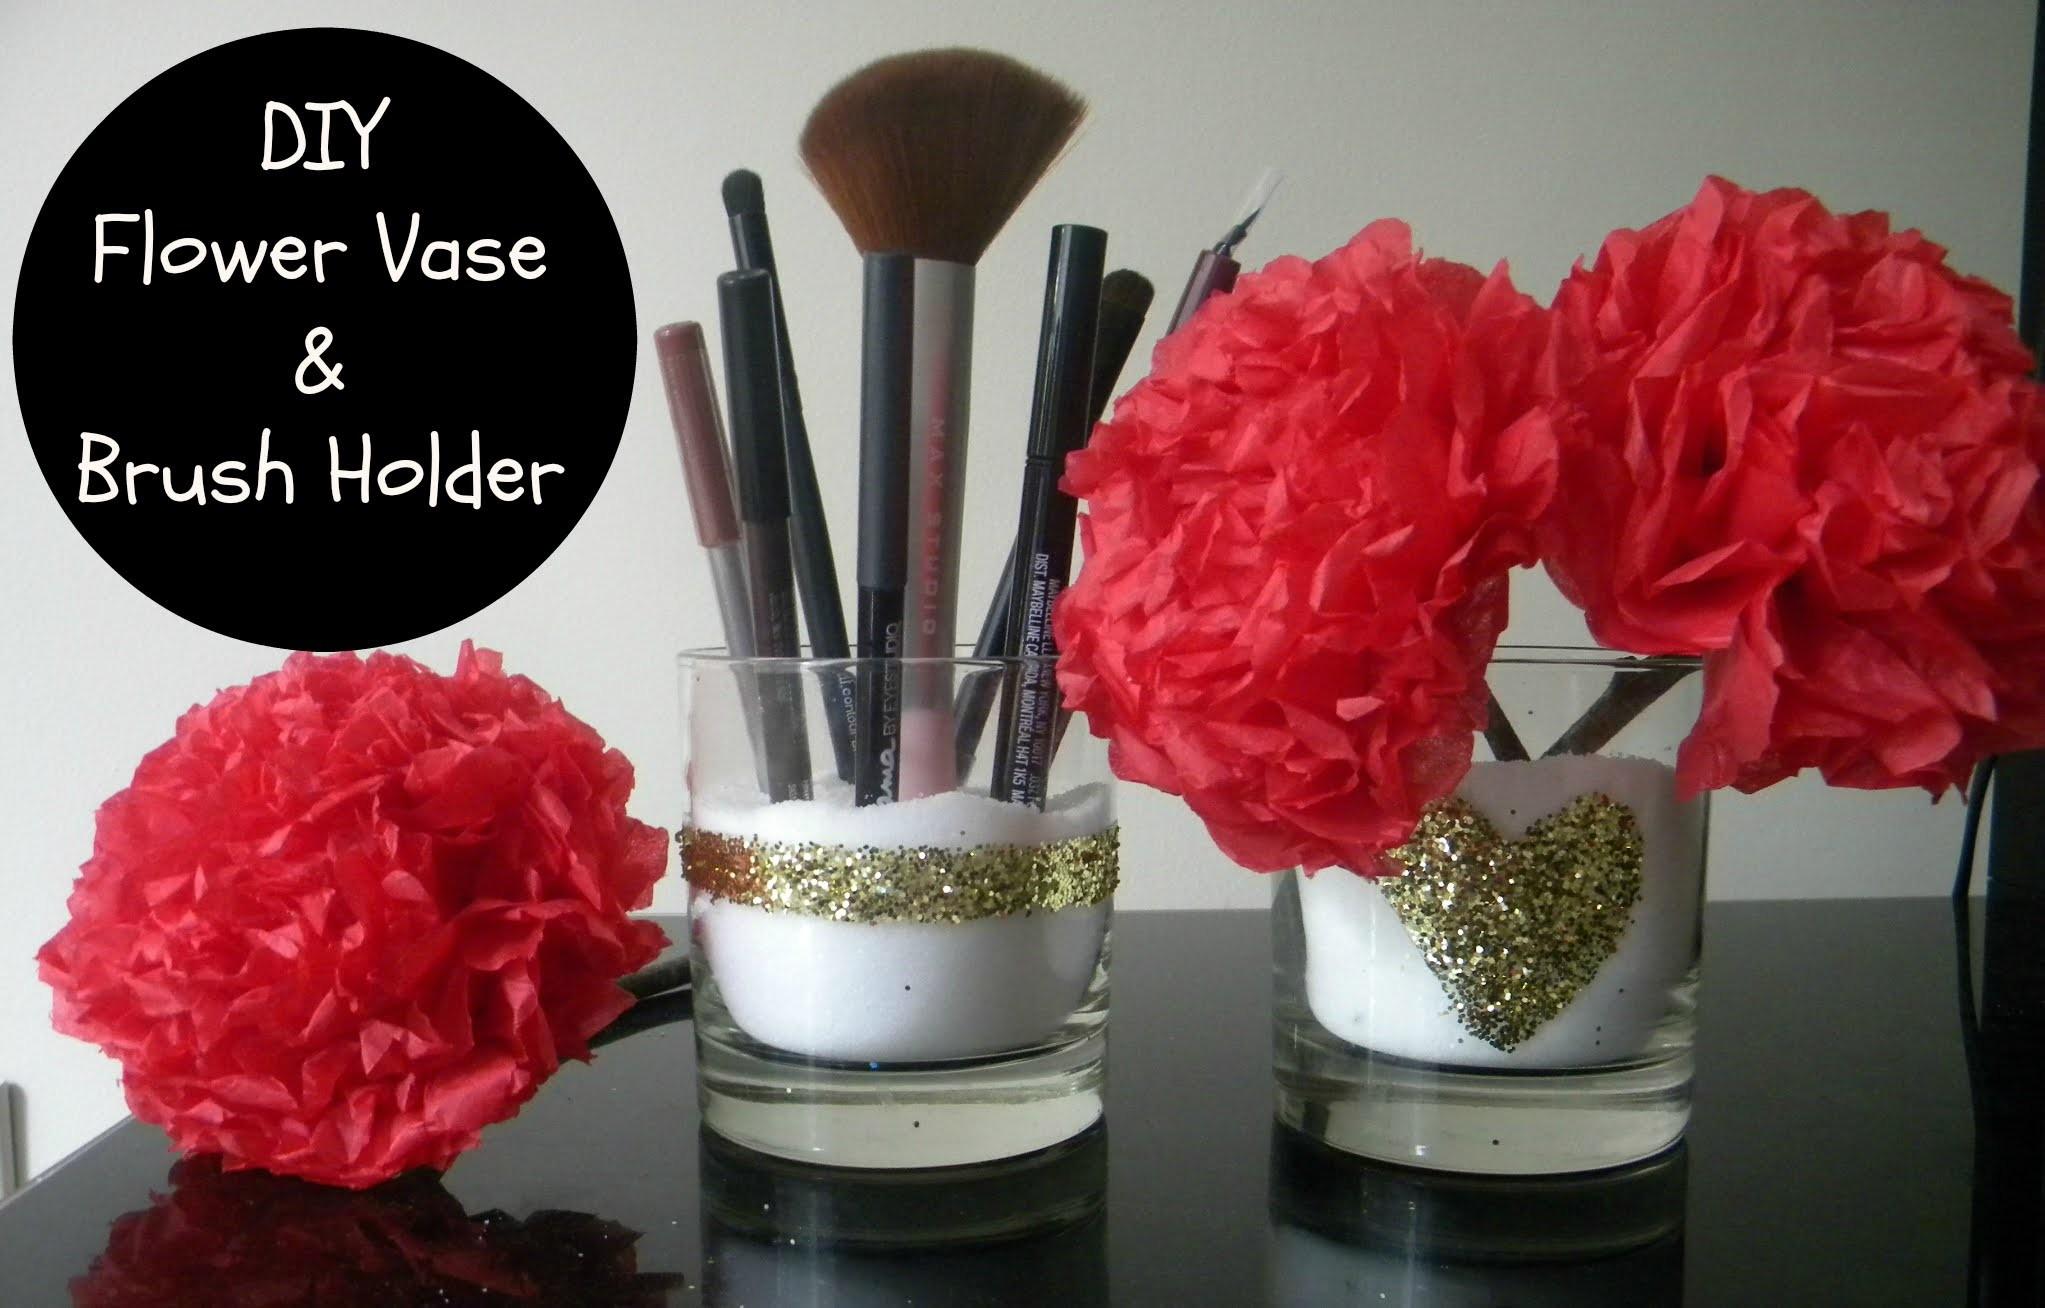 Diy Makeup Brush Holder & Flower Vase